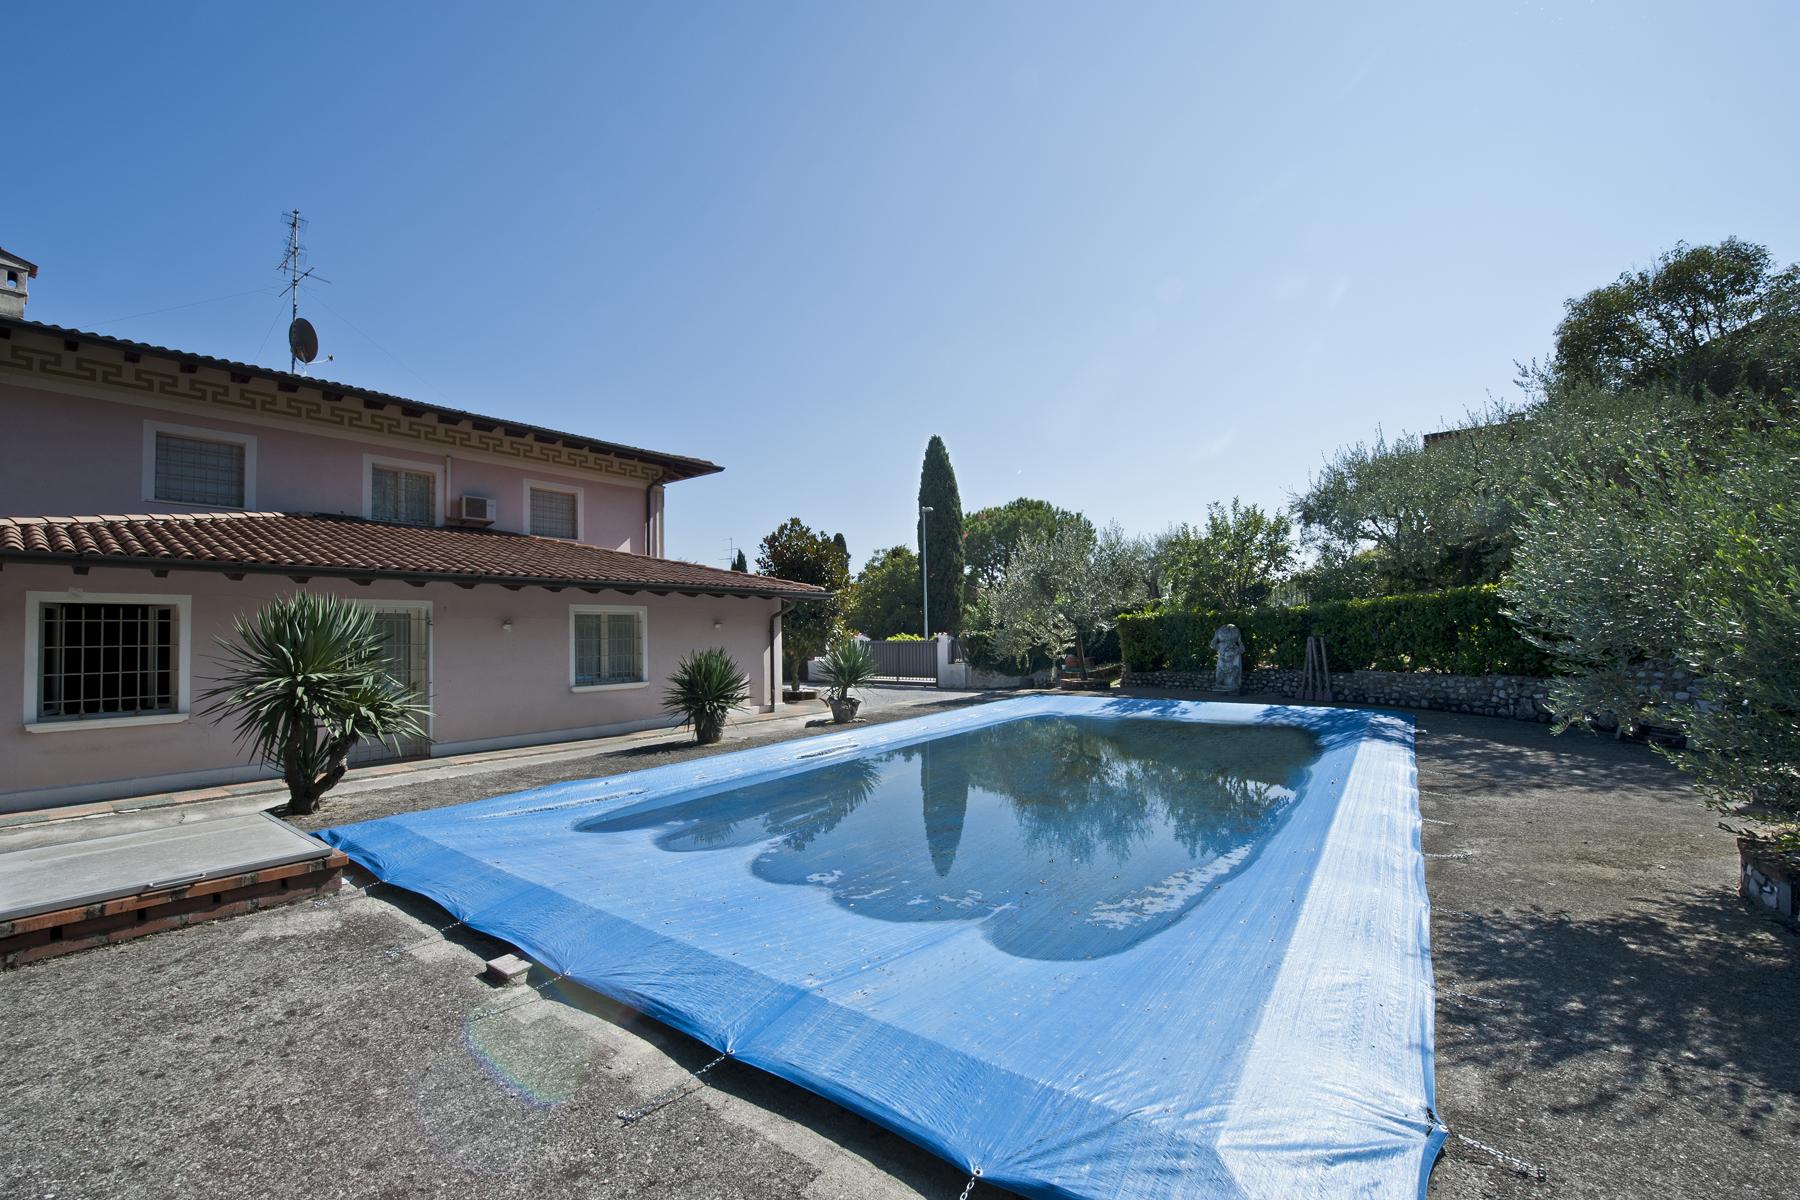 Villa in Vendita a Padenghe Sul Garda: 5 locali, 400 mq - Foto 14